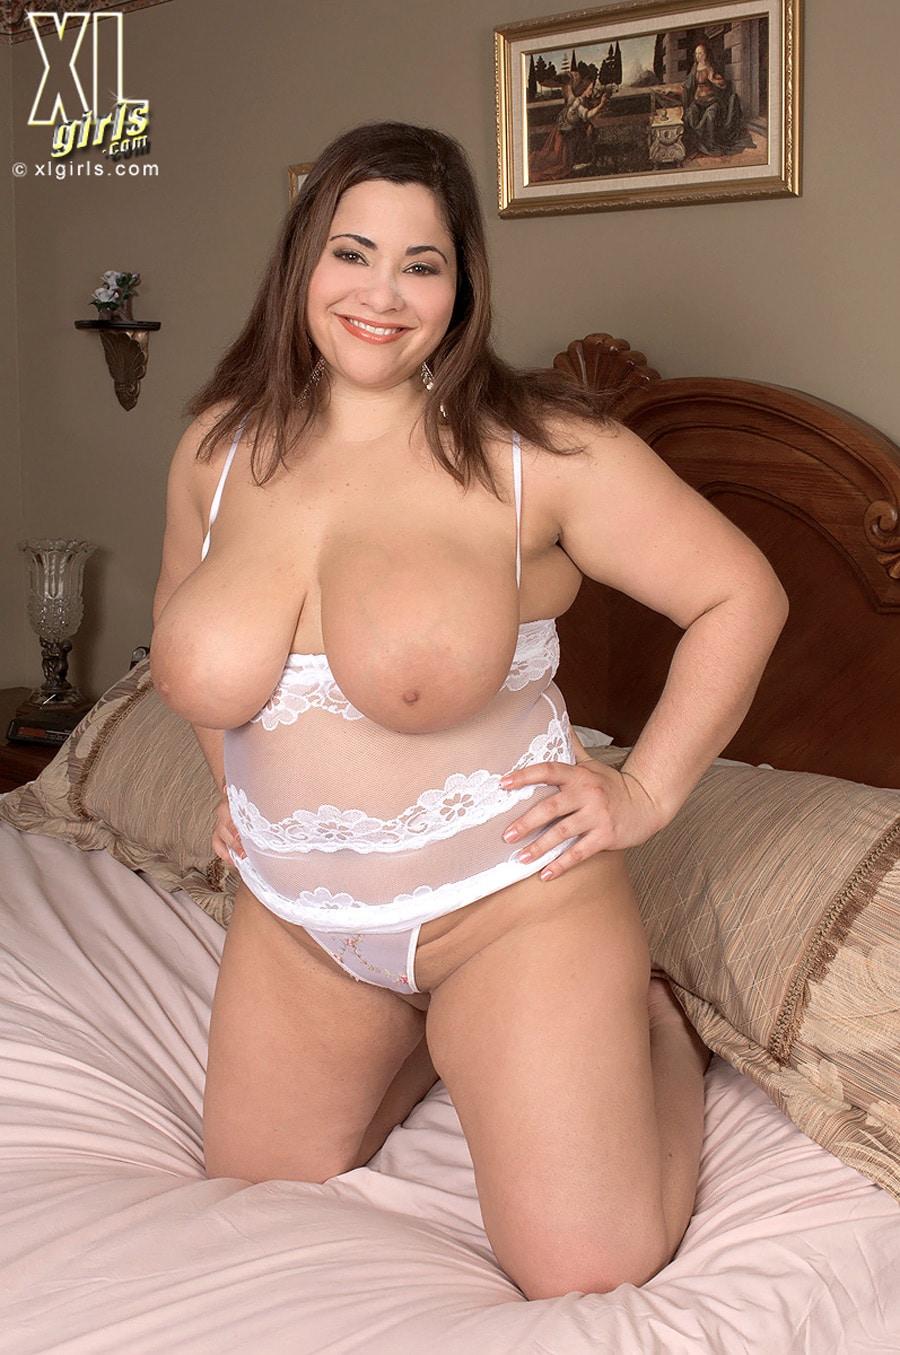 Xl naked girls porno commit error